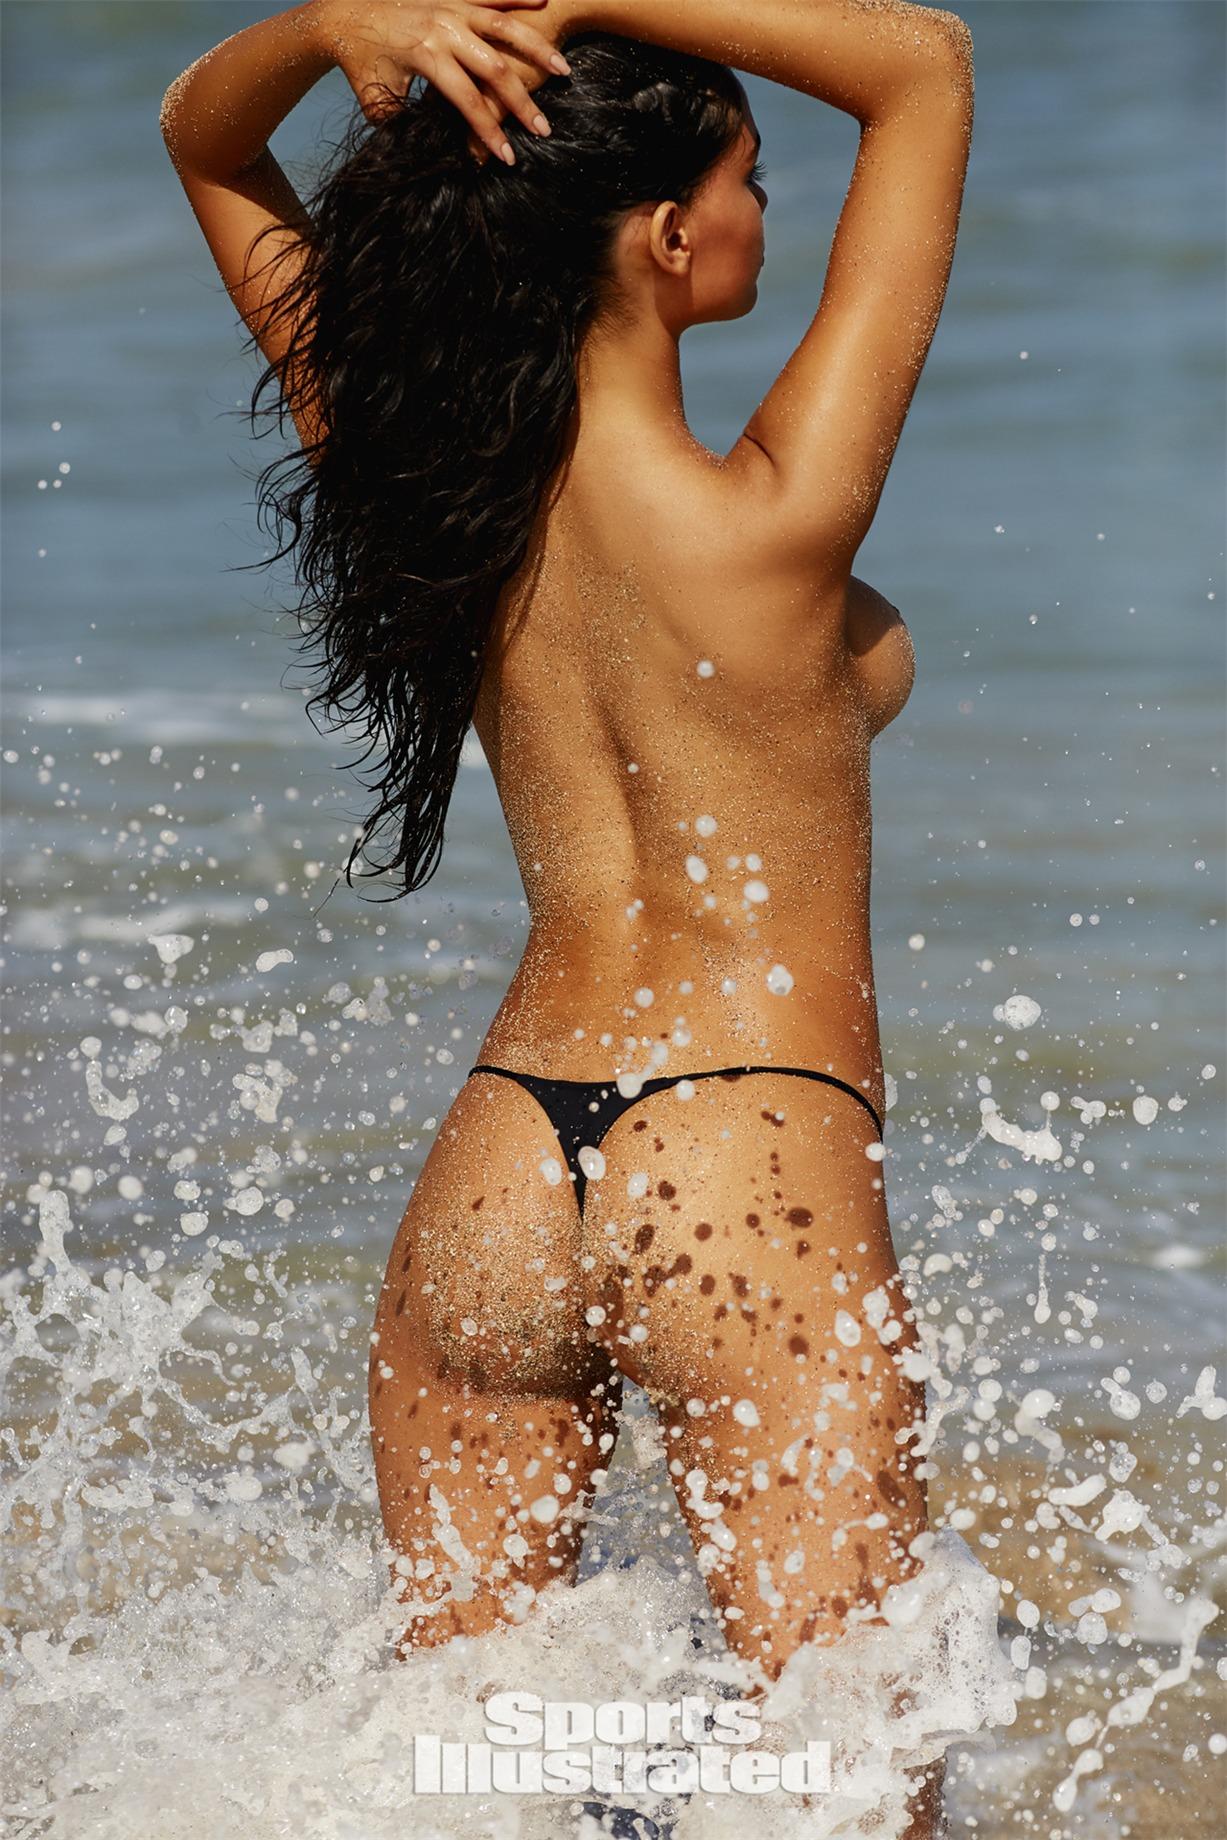 Anne DePaula / Энни ди Паула в купальниках из новой коллекции Sports Illustrated Swimsuit 2018 issue / in Nevis by Josie Clough